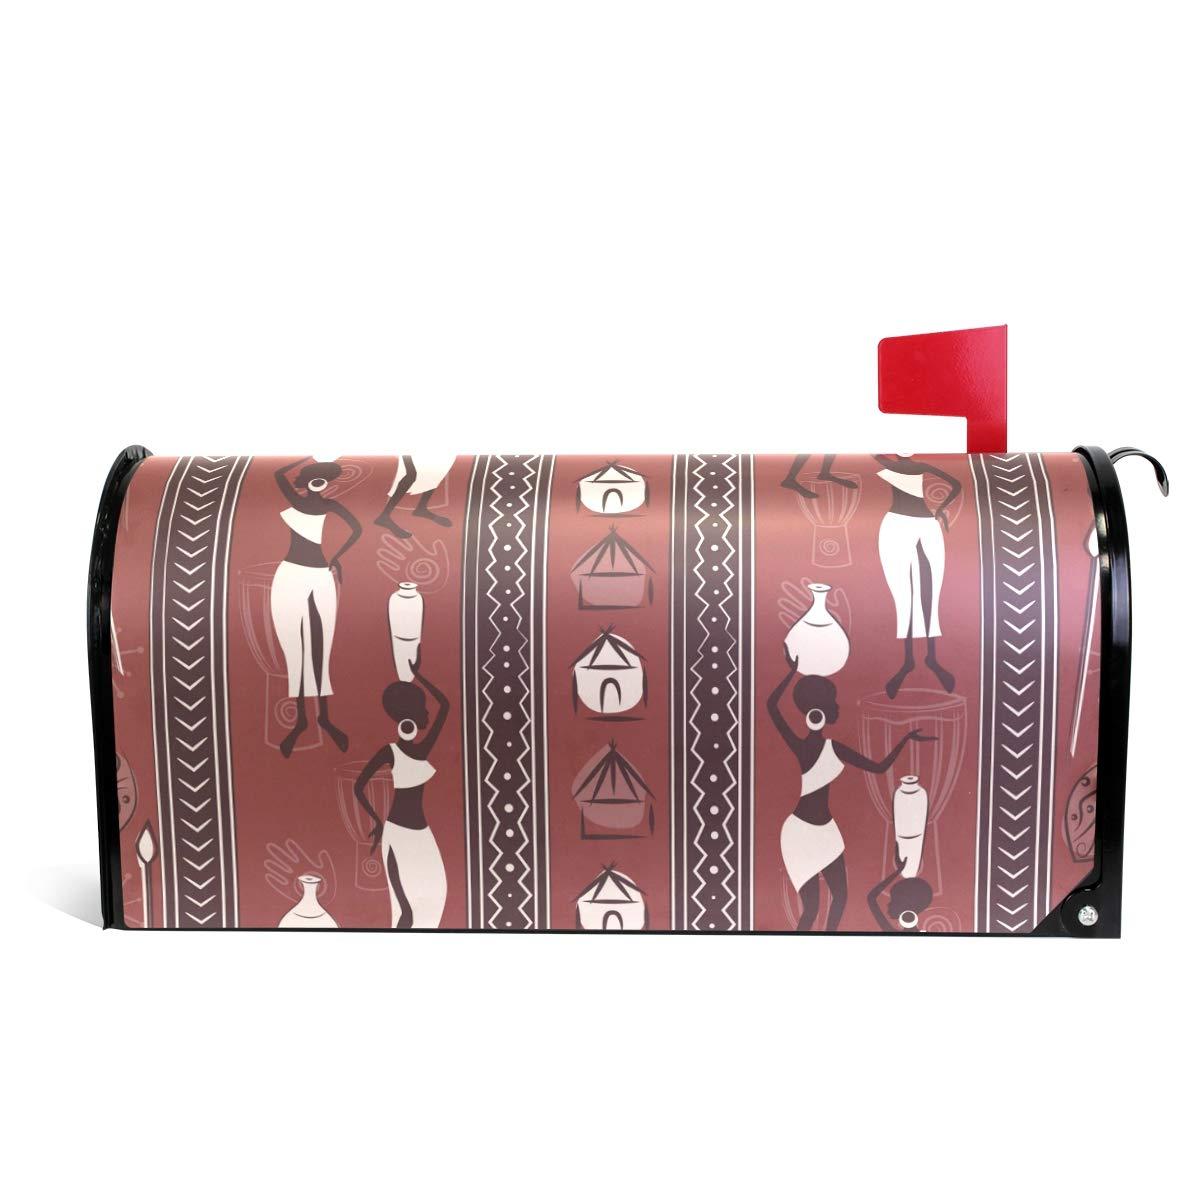 senya Home Garden African Ethnic Women Pattern Magnetic Mailbox Cover Standard